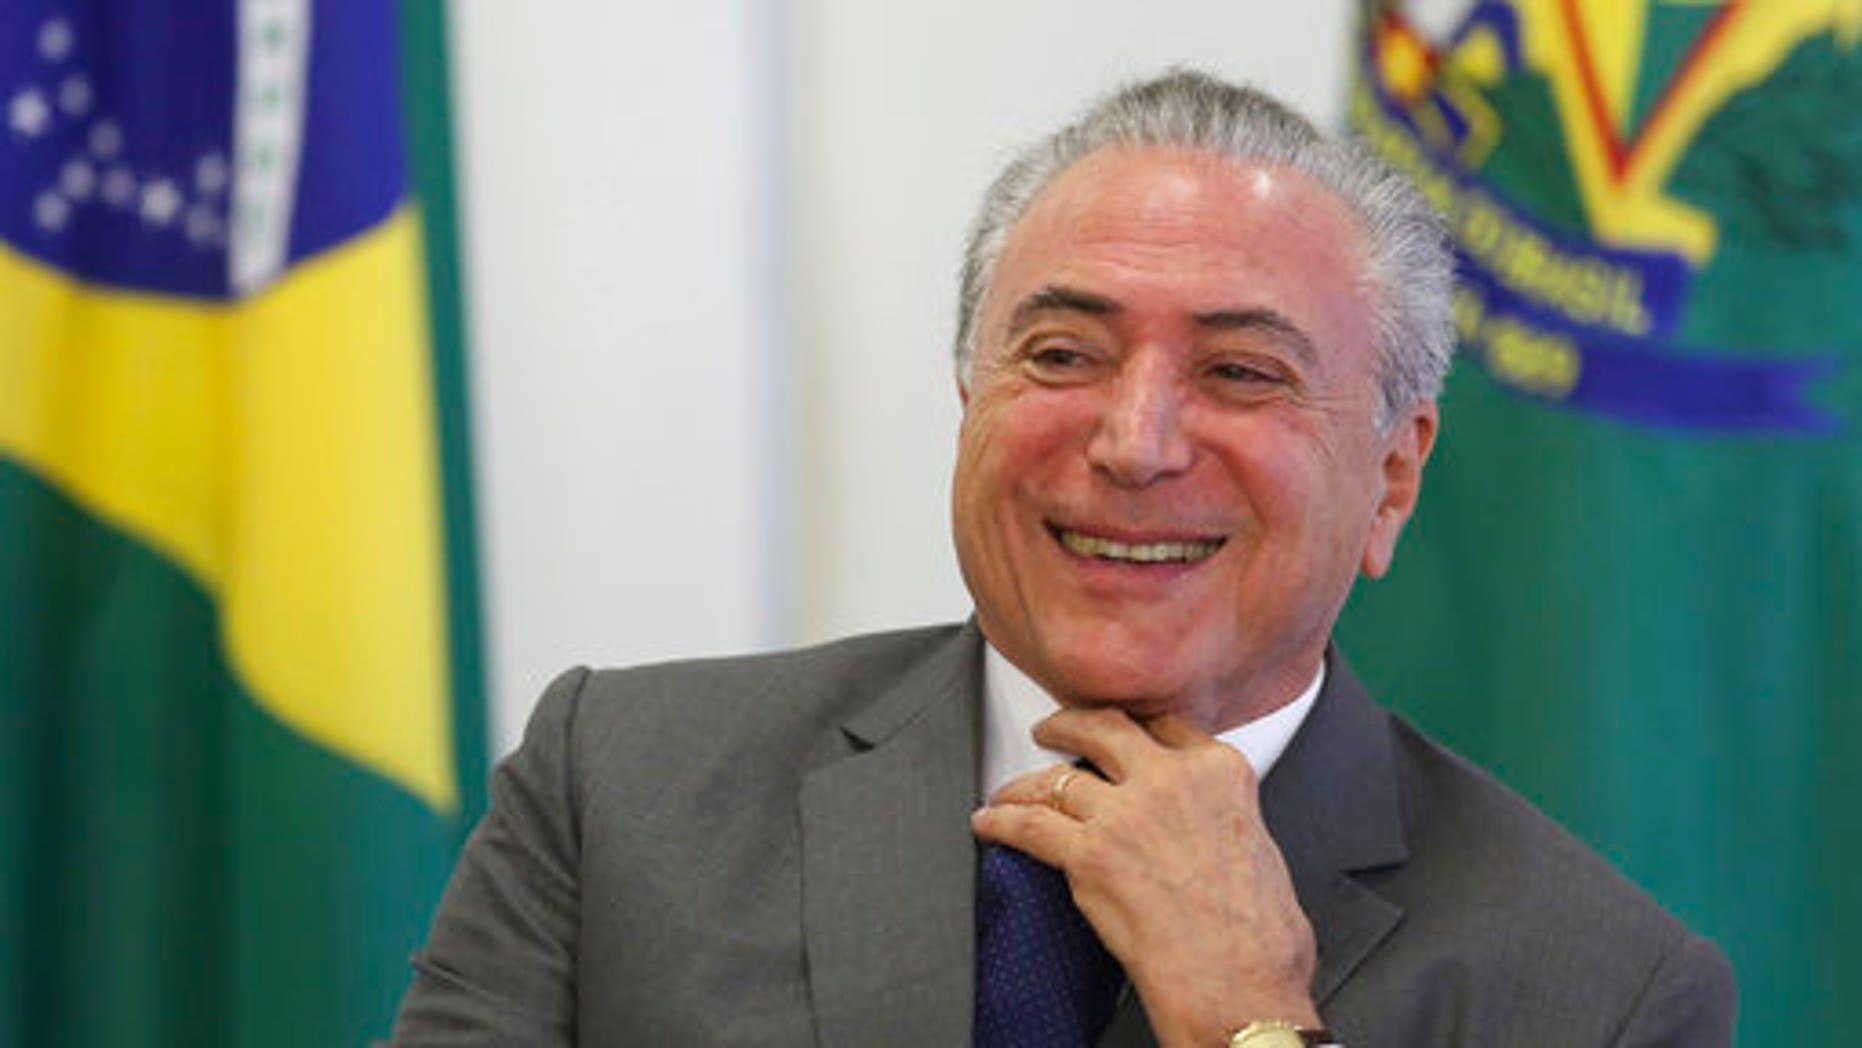 President Temer during a ceremony at the Planalto presidential palace, in Brasilia, Brazil, April 12, 2017.